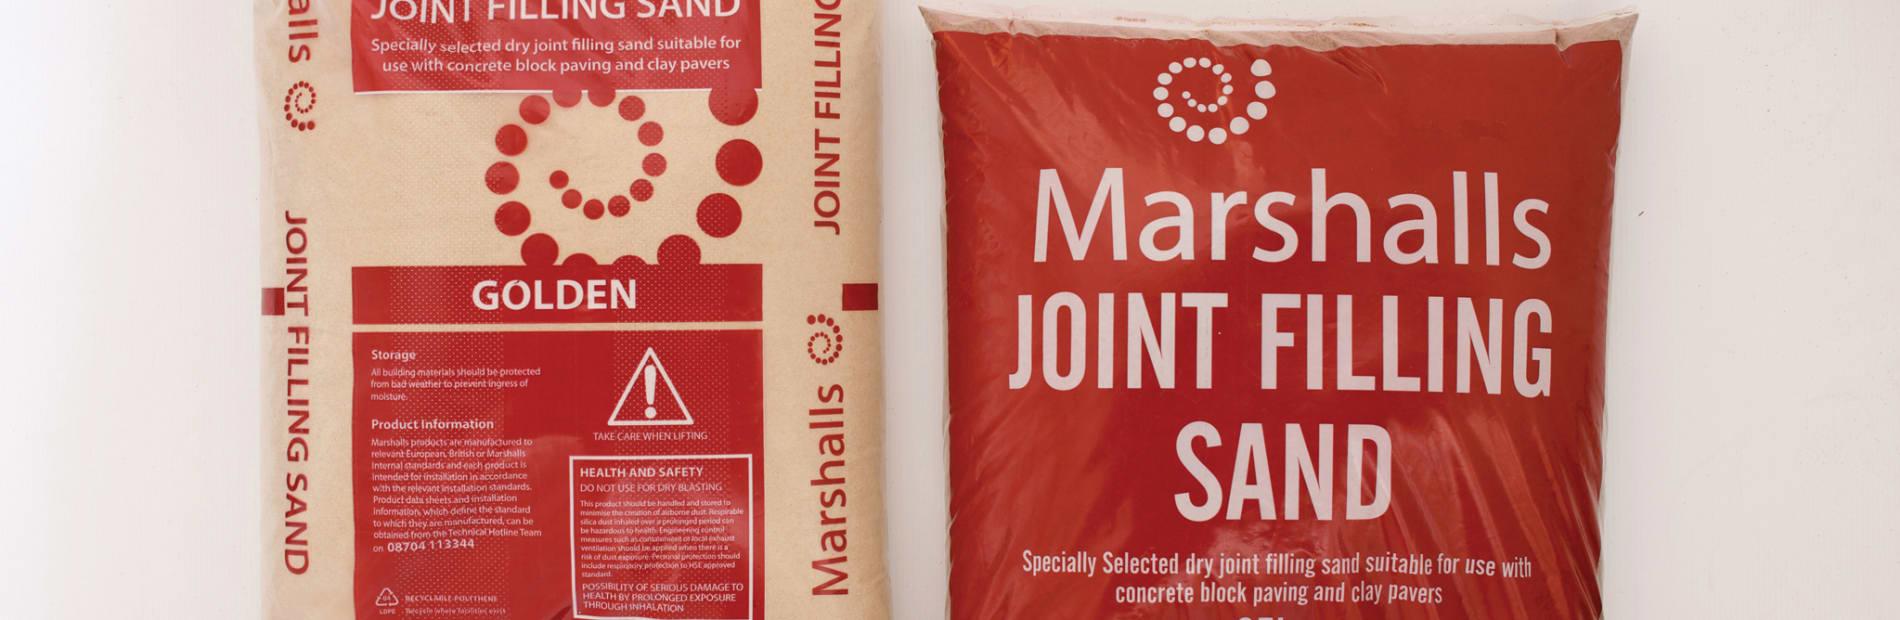 a bag of sand